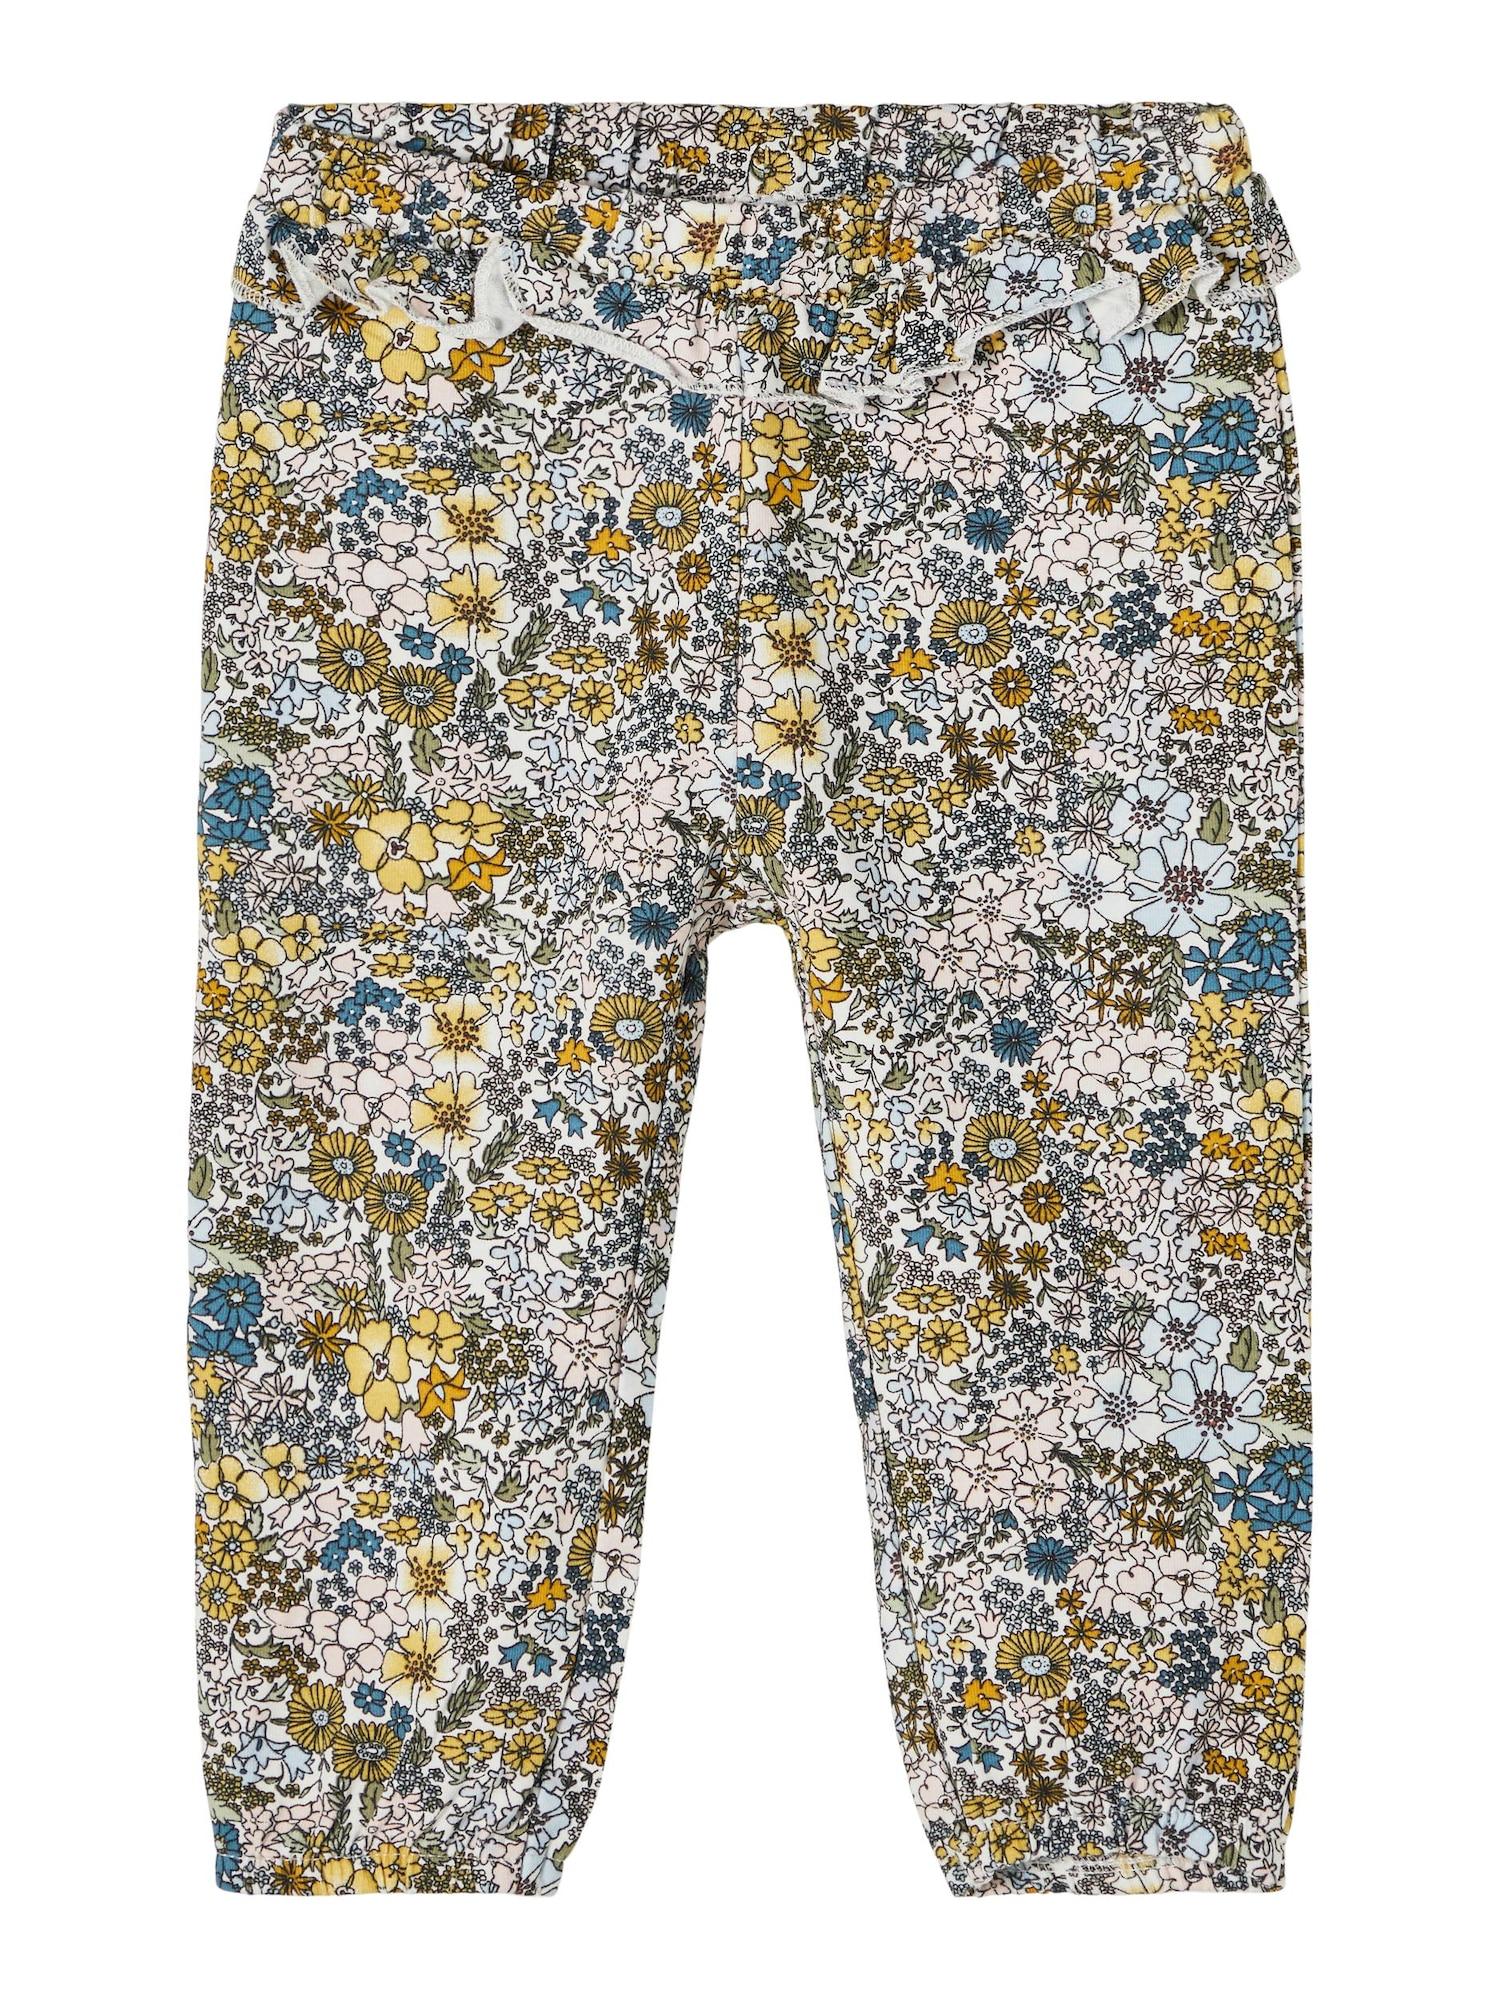 NAME IT Kelnės 'Dahlia' natūrali balta / geltona / mėlyna / juoda